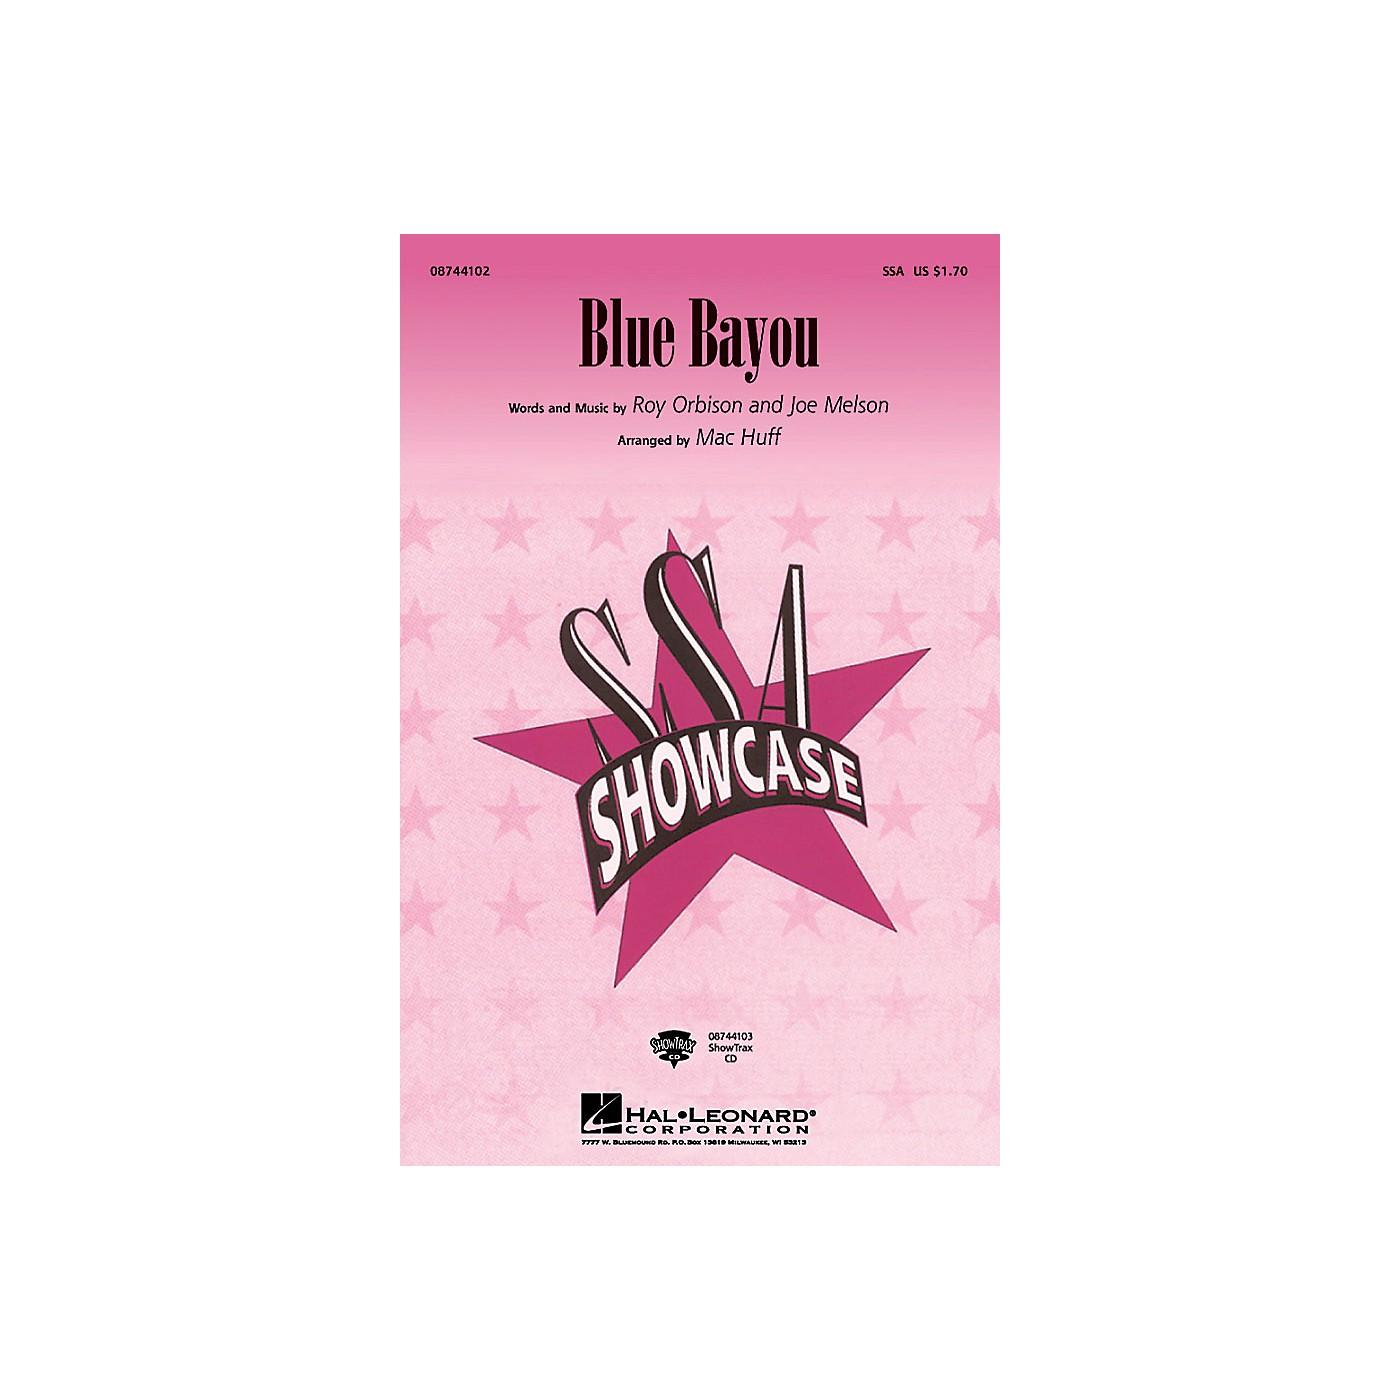 Hal Leonard Blue Bayou SSA arranged by Mac Huff thumbnail